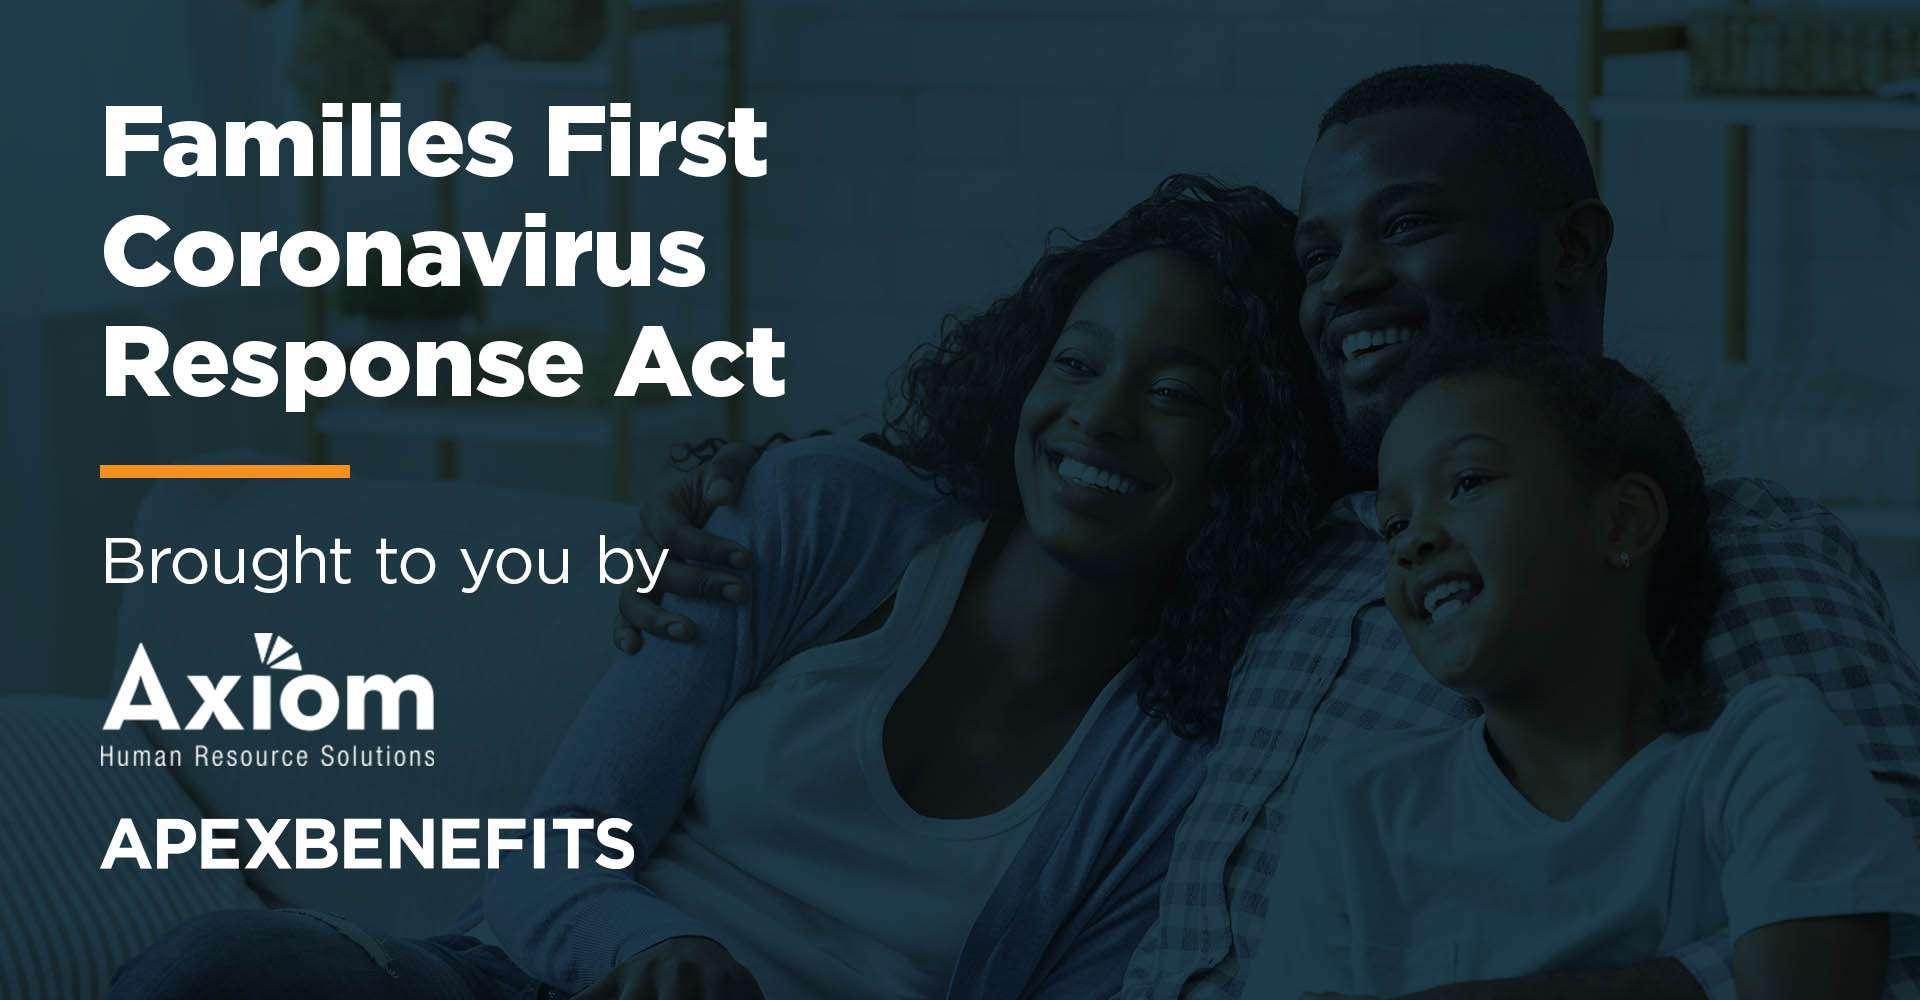 Families First Coronavirus Response Act Information